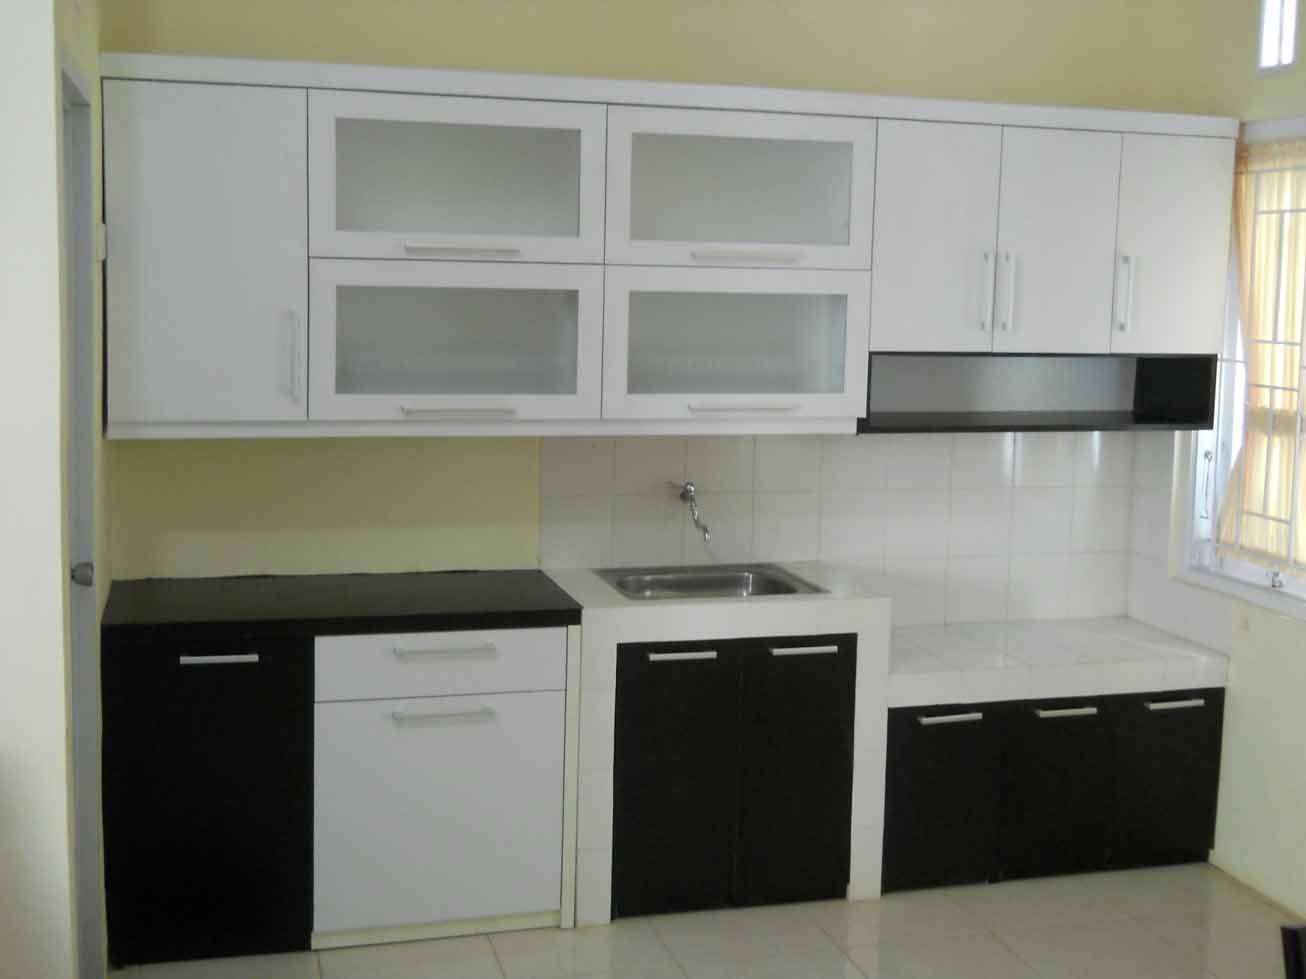 Desain Kitchen Set Bentuk Lurus Smallkitchenreview Co